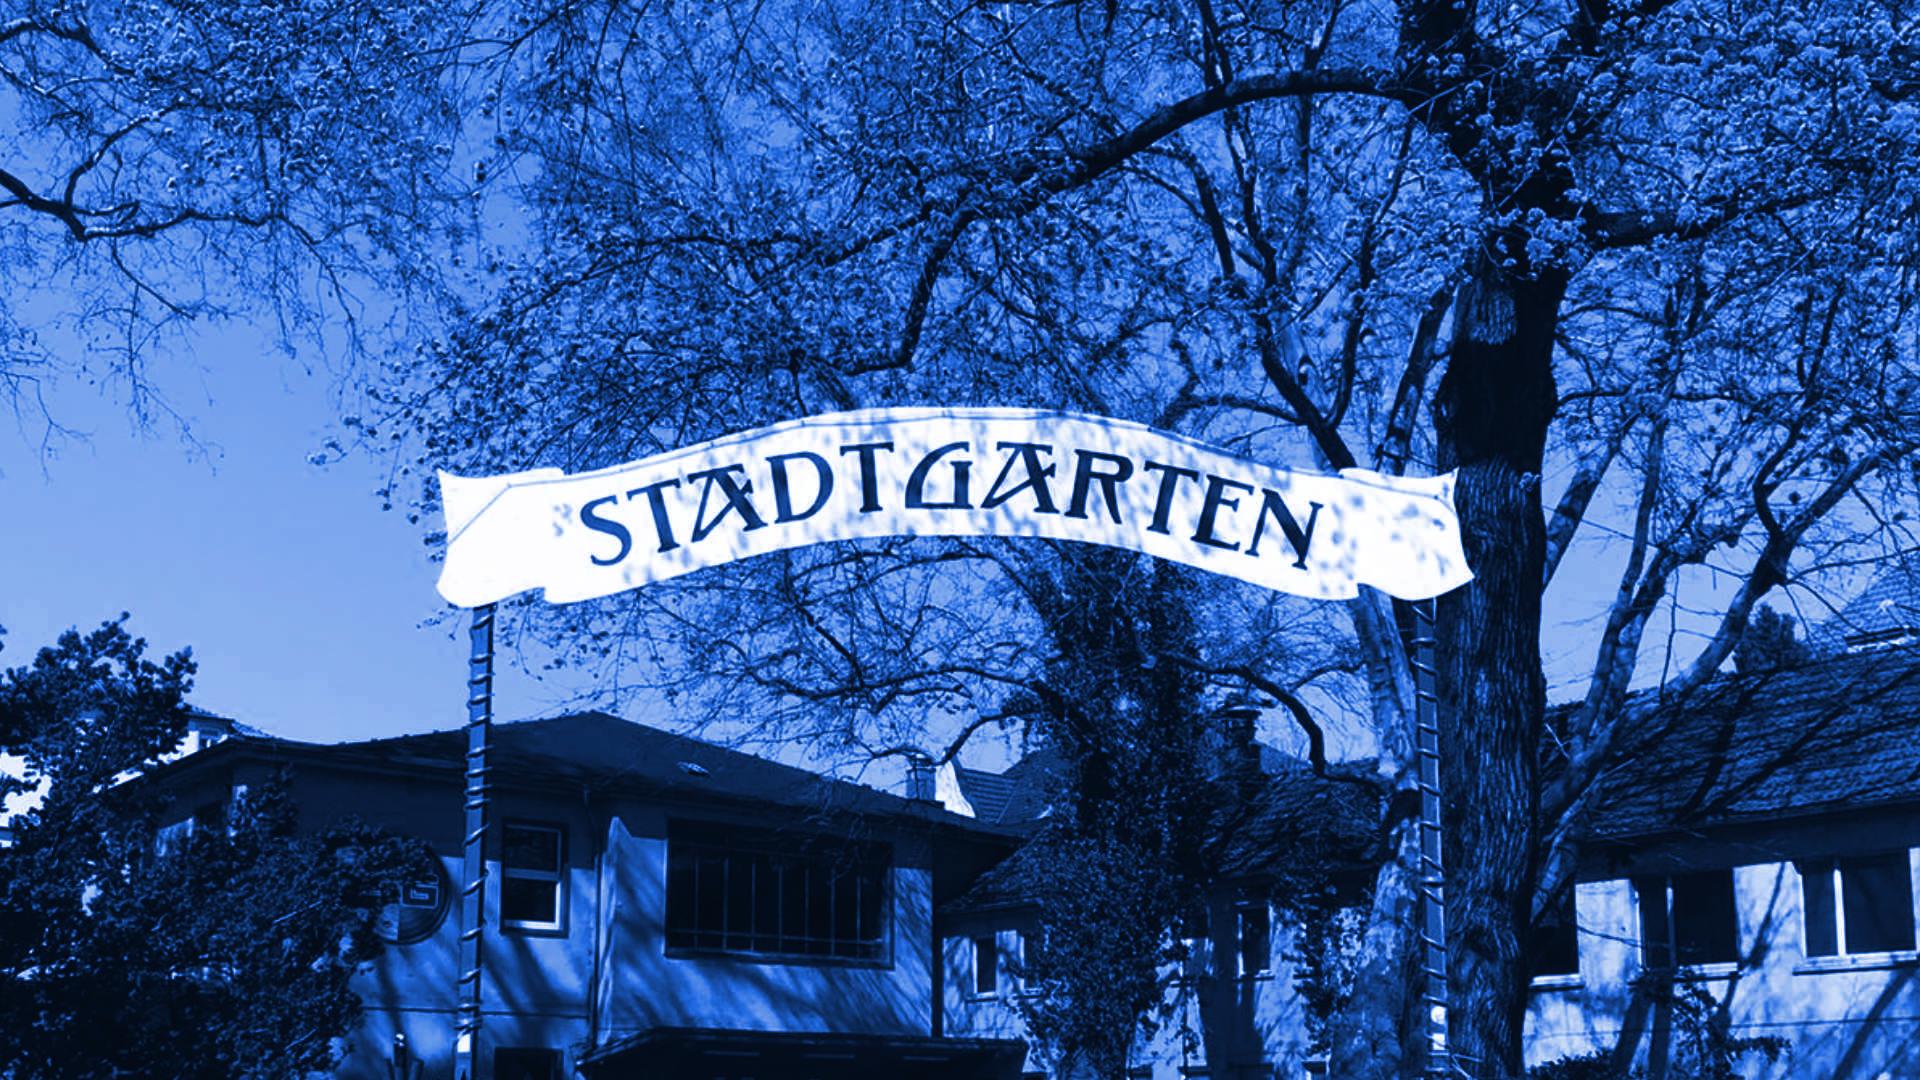 Stadtgarten: Leerstand statt Kulturstätte